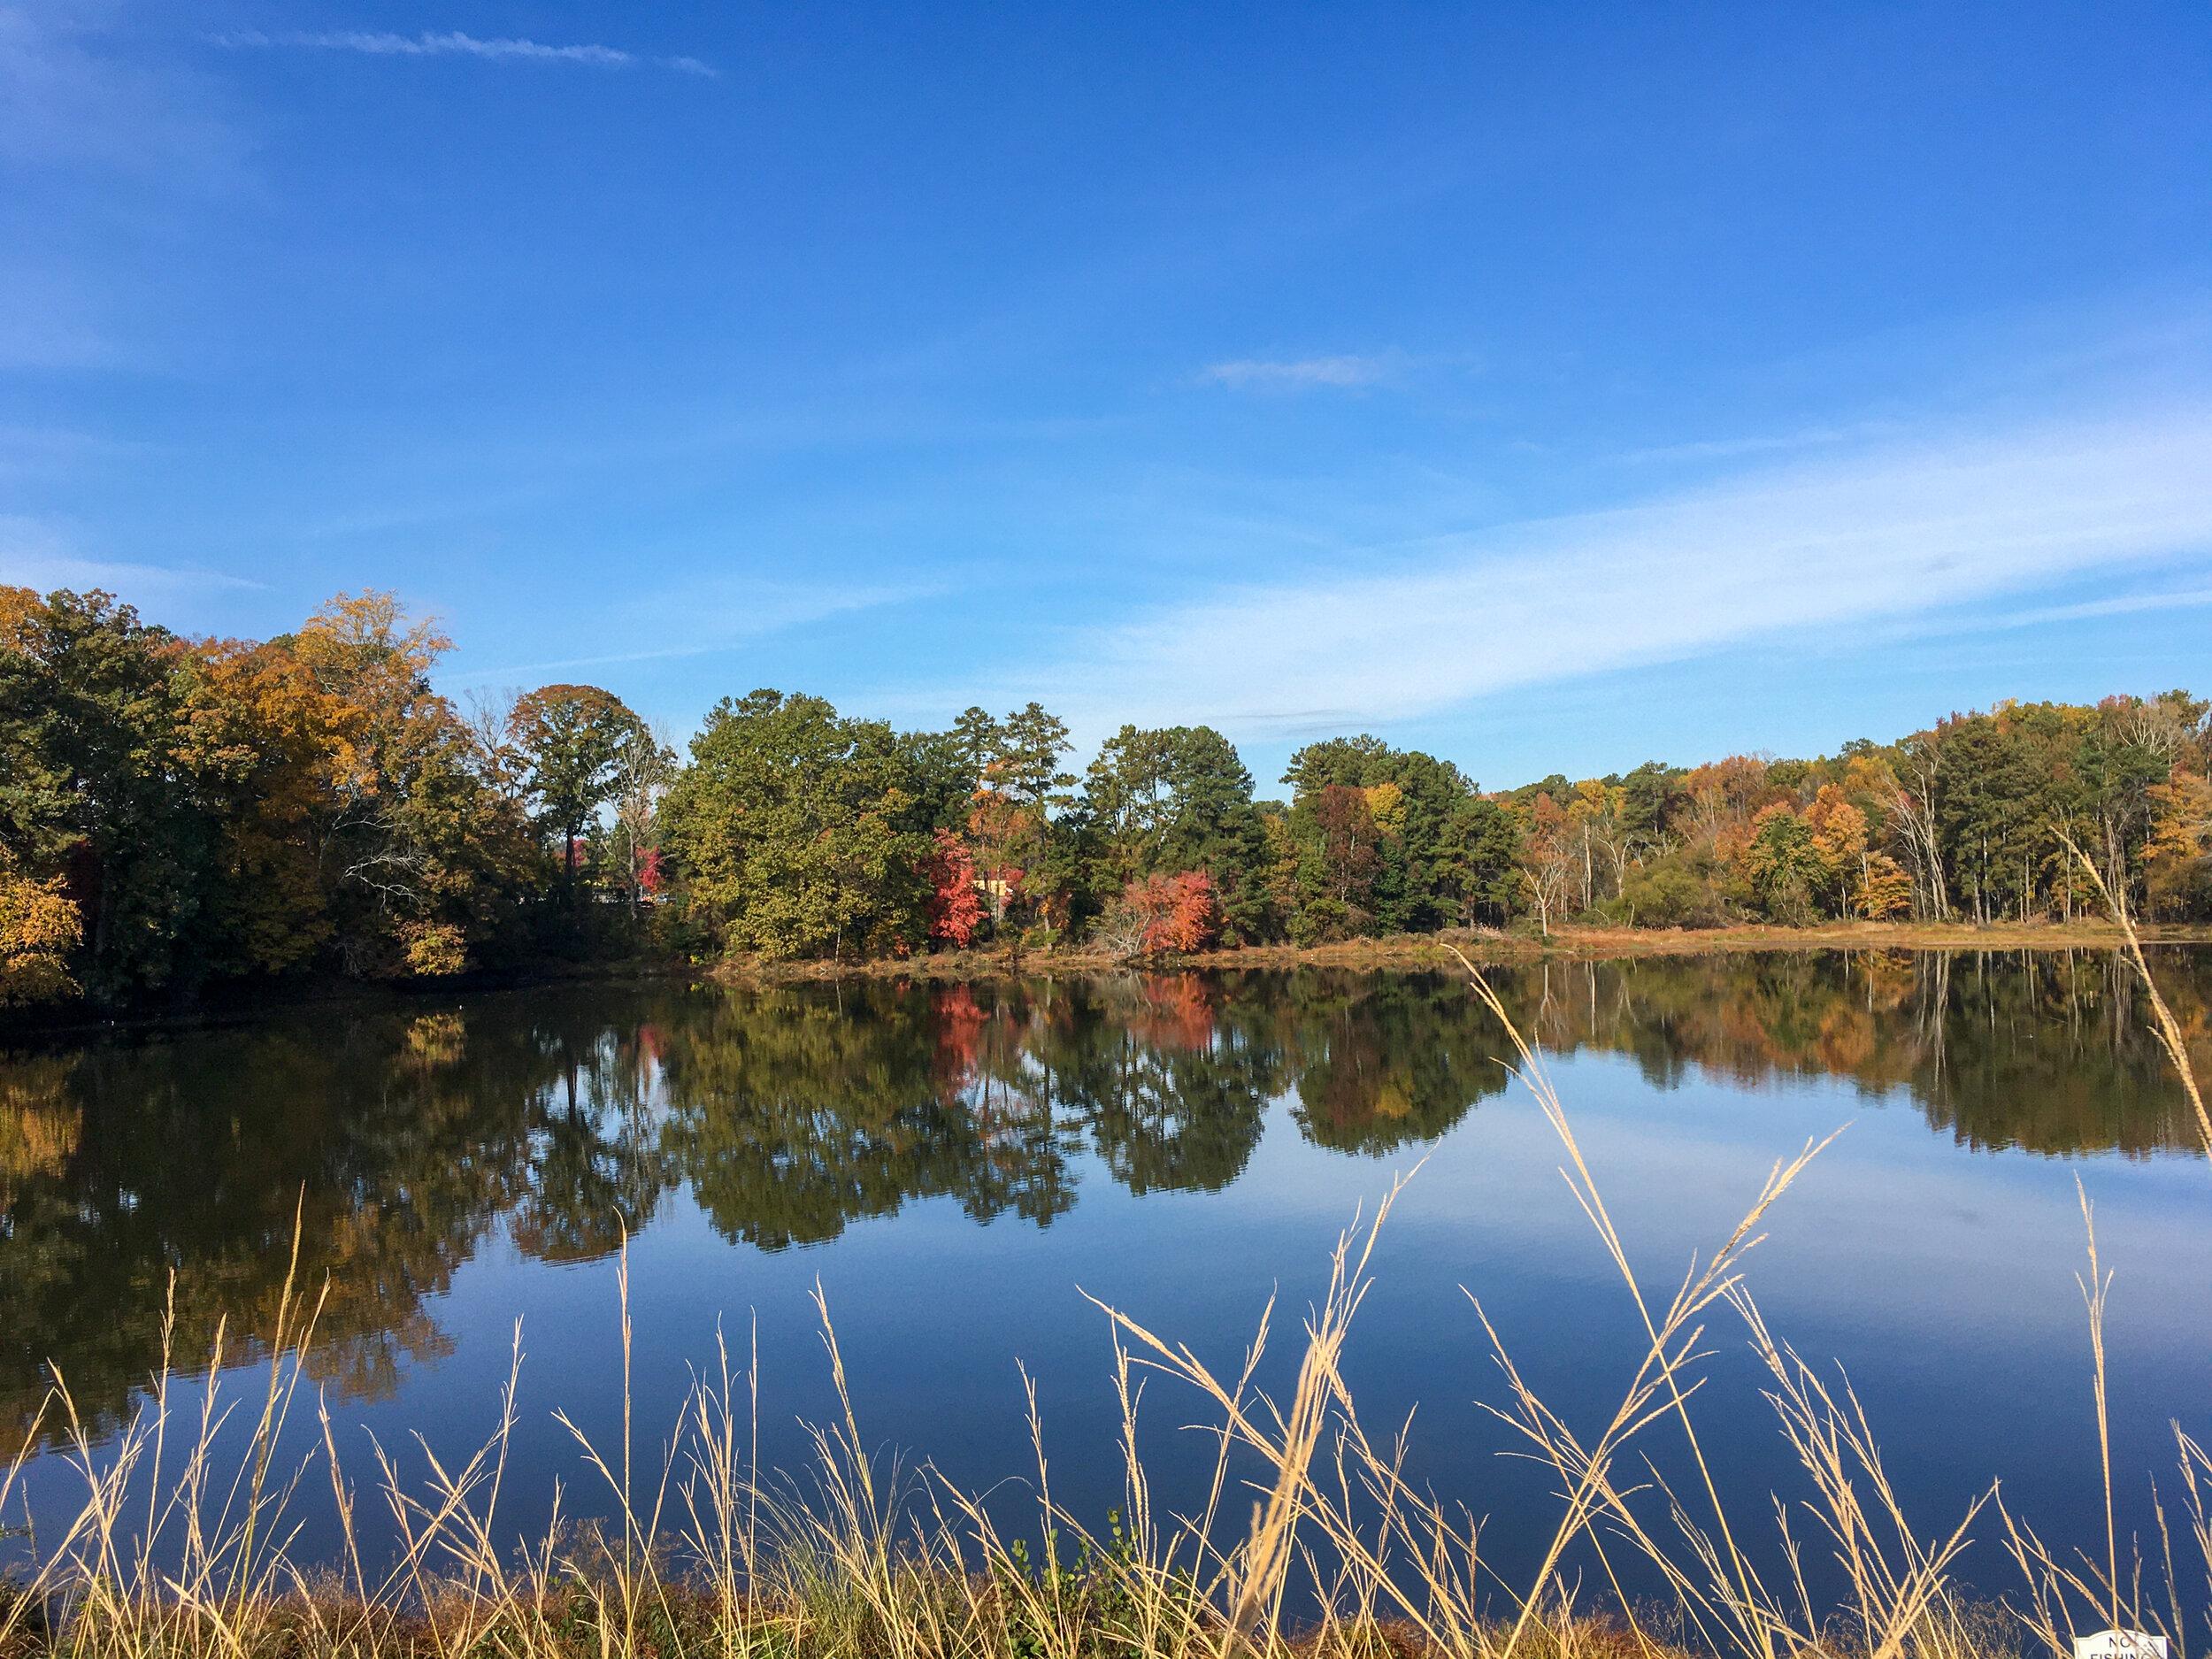 Nelson Lake, November 11, 2019